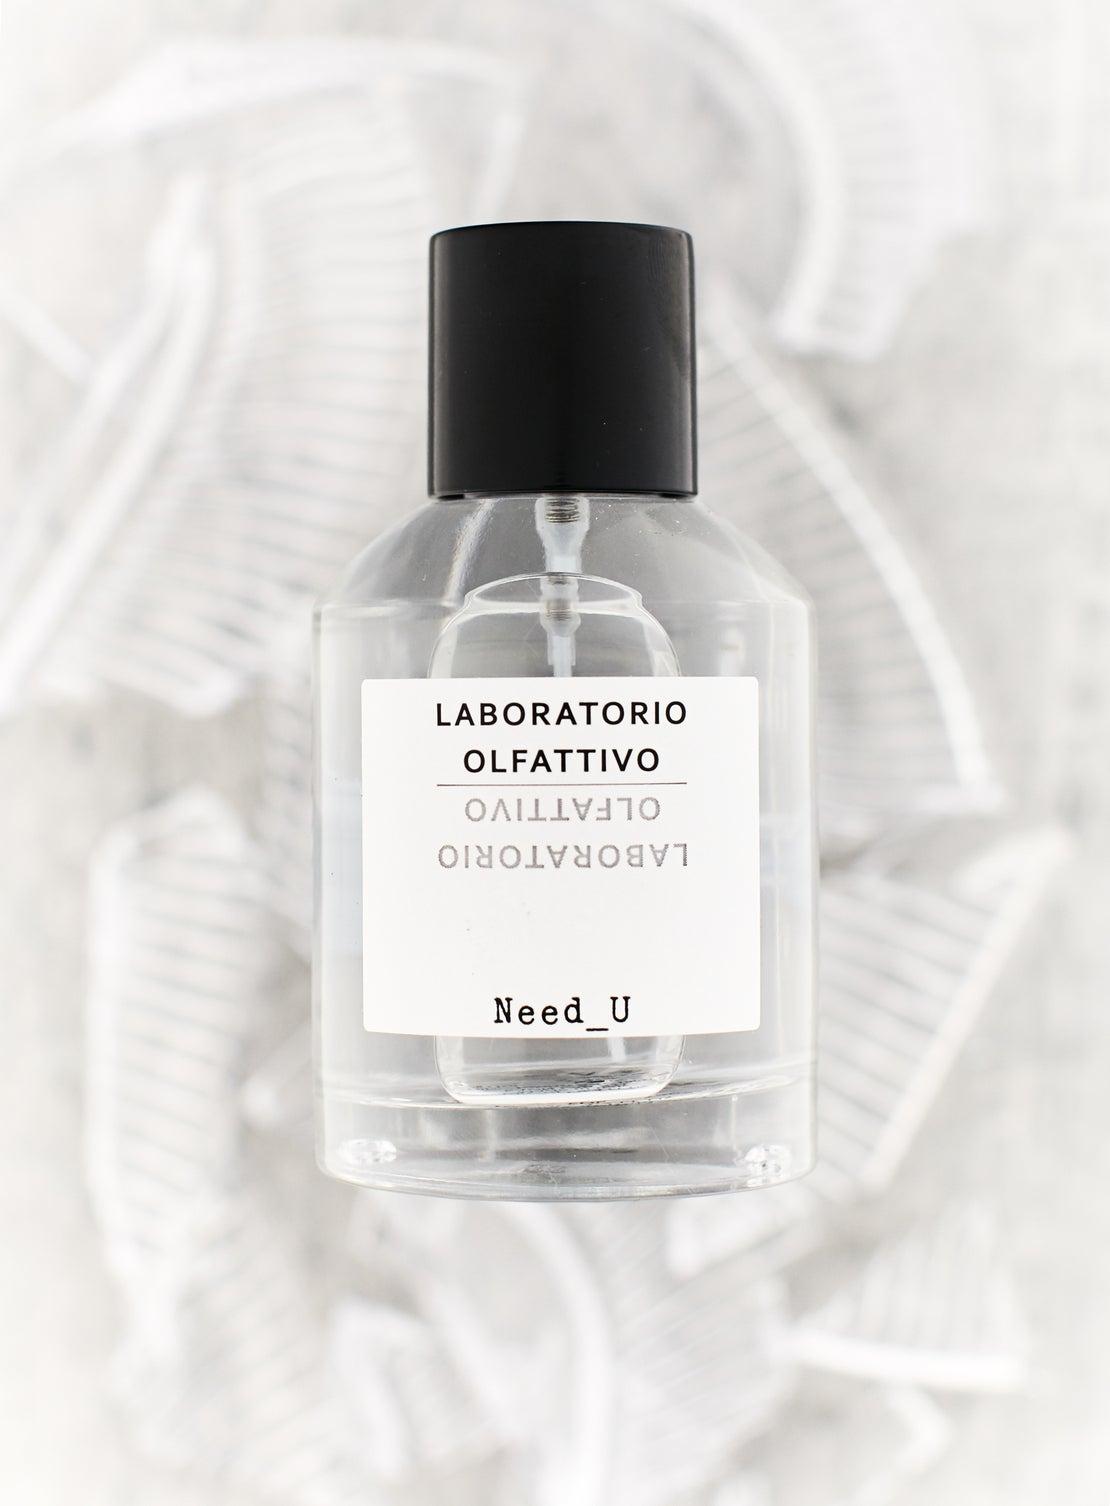 Laboratorio Olfattivo - Need_U 30mL